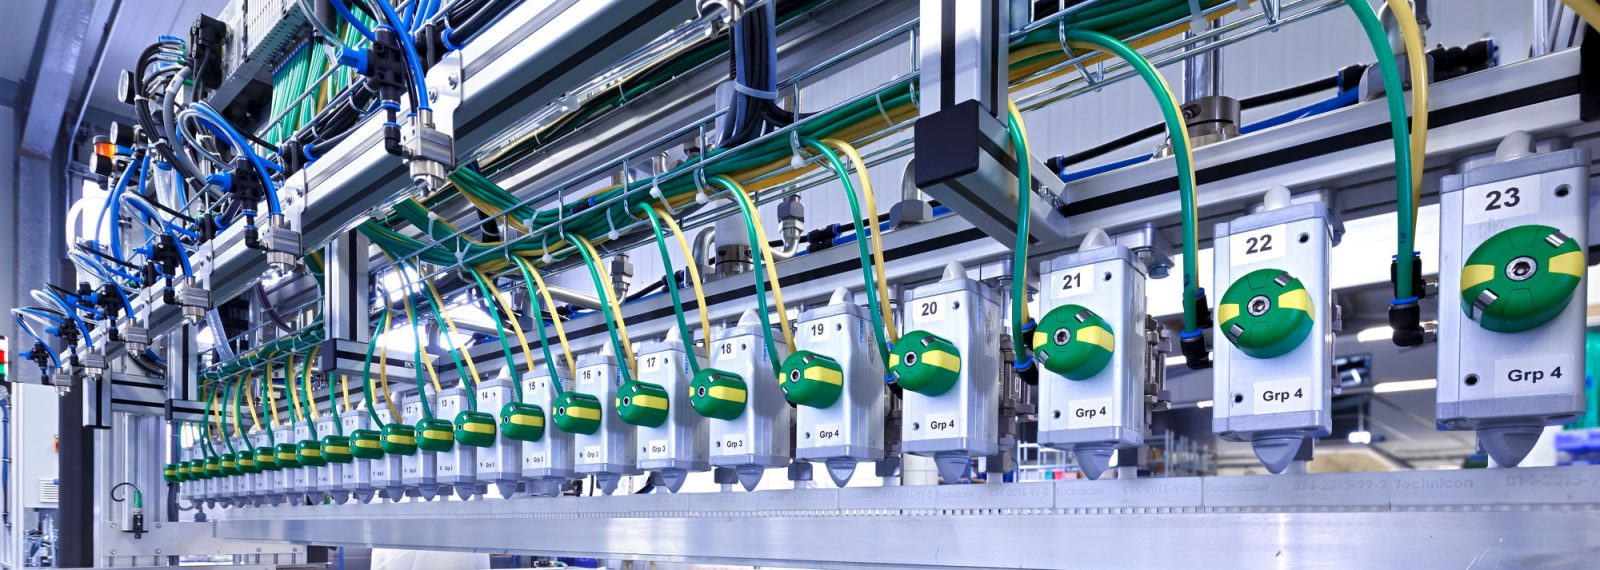 1K-Klebstoffauftragssystem